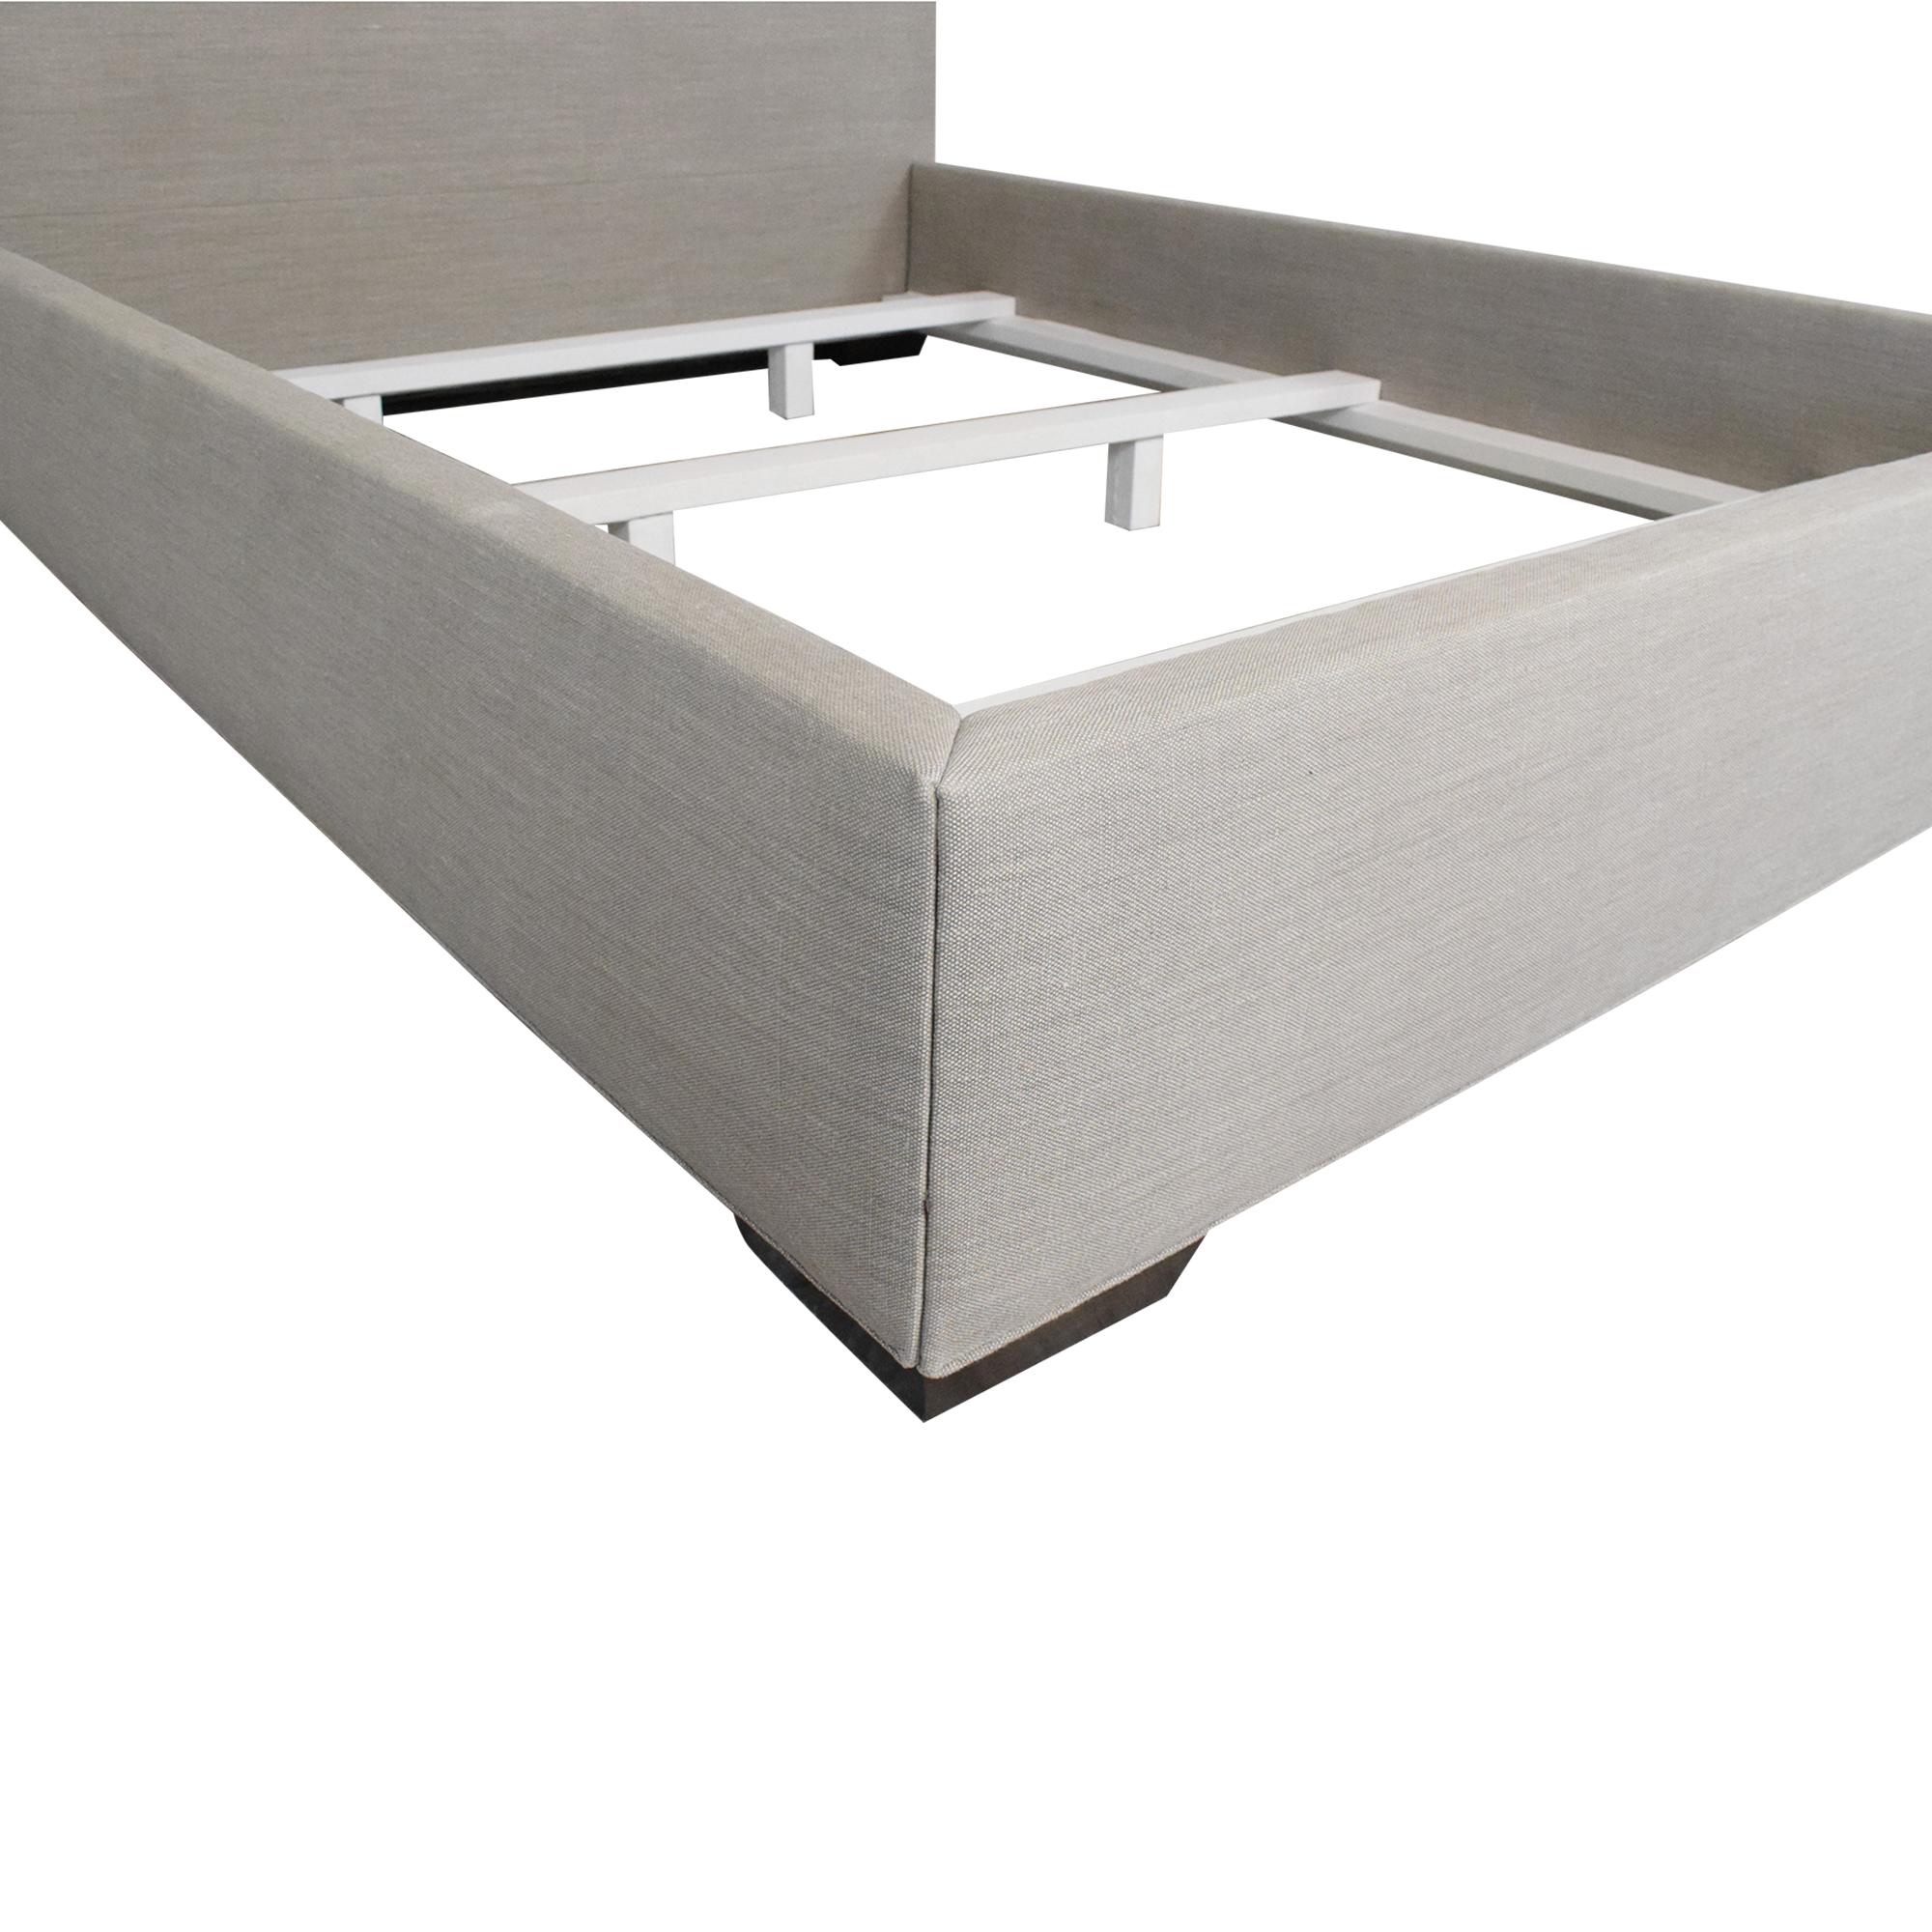 Christian Grevstad Saturna Upholstered Queen Bed / Beds